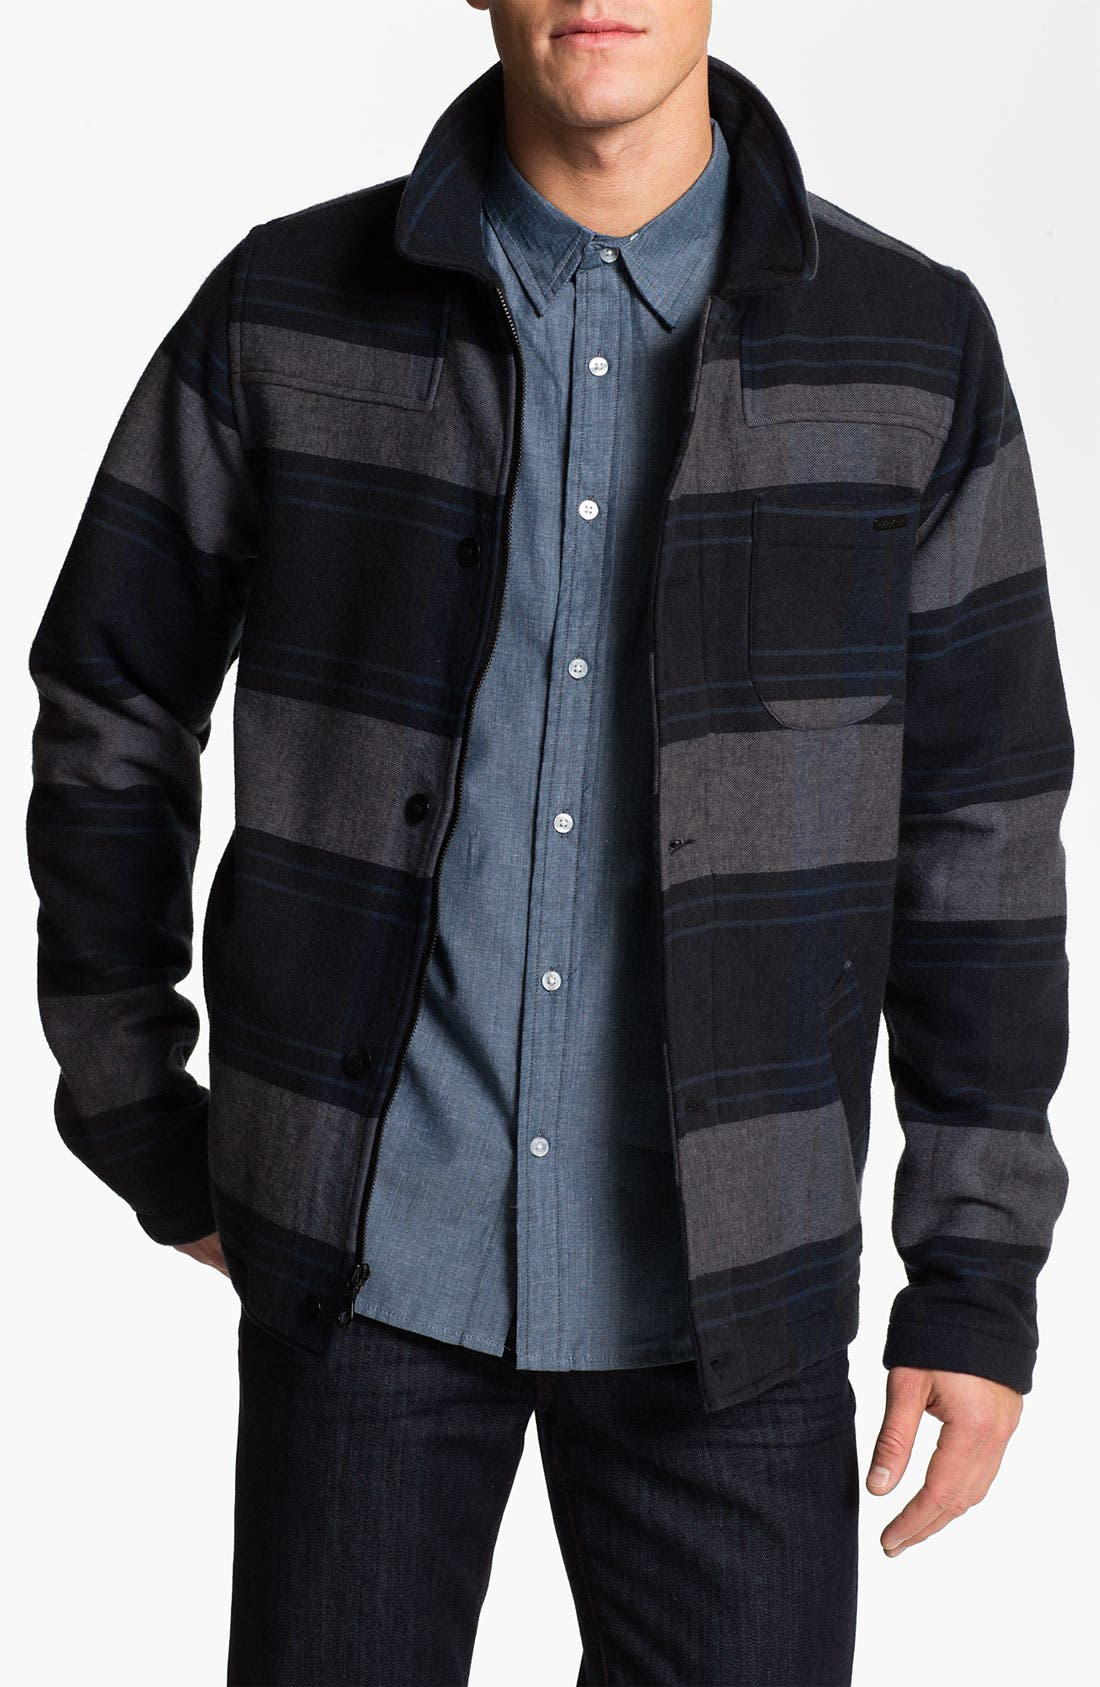 Alternate Image 1 Selected - Ezekiel 'Ellis' Stripe Jacket